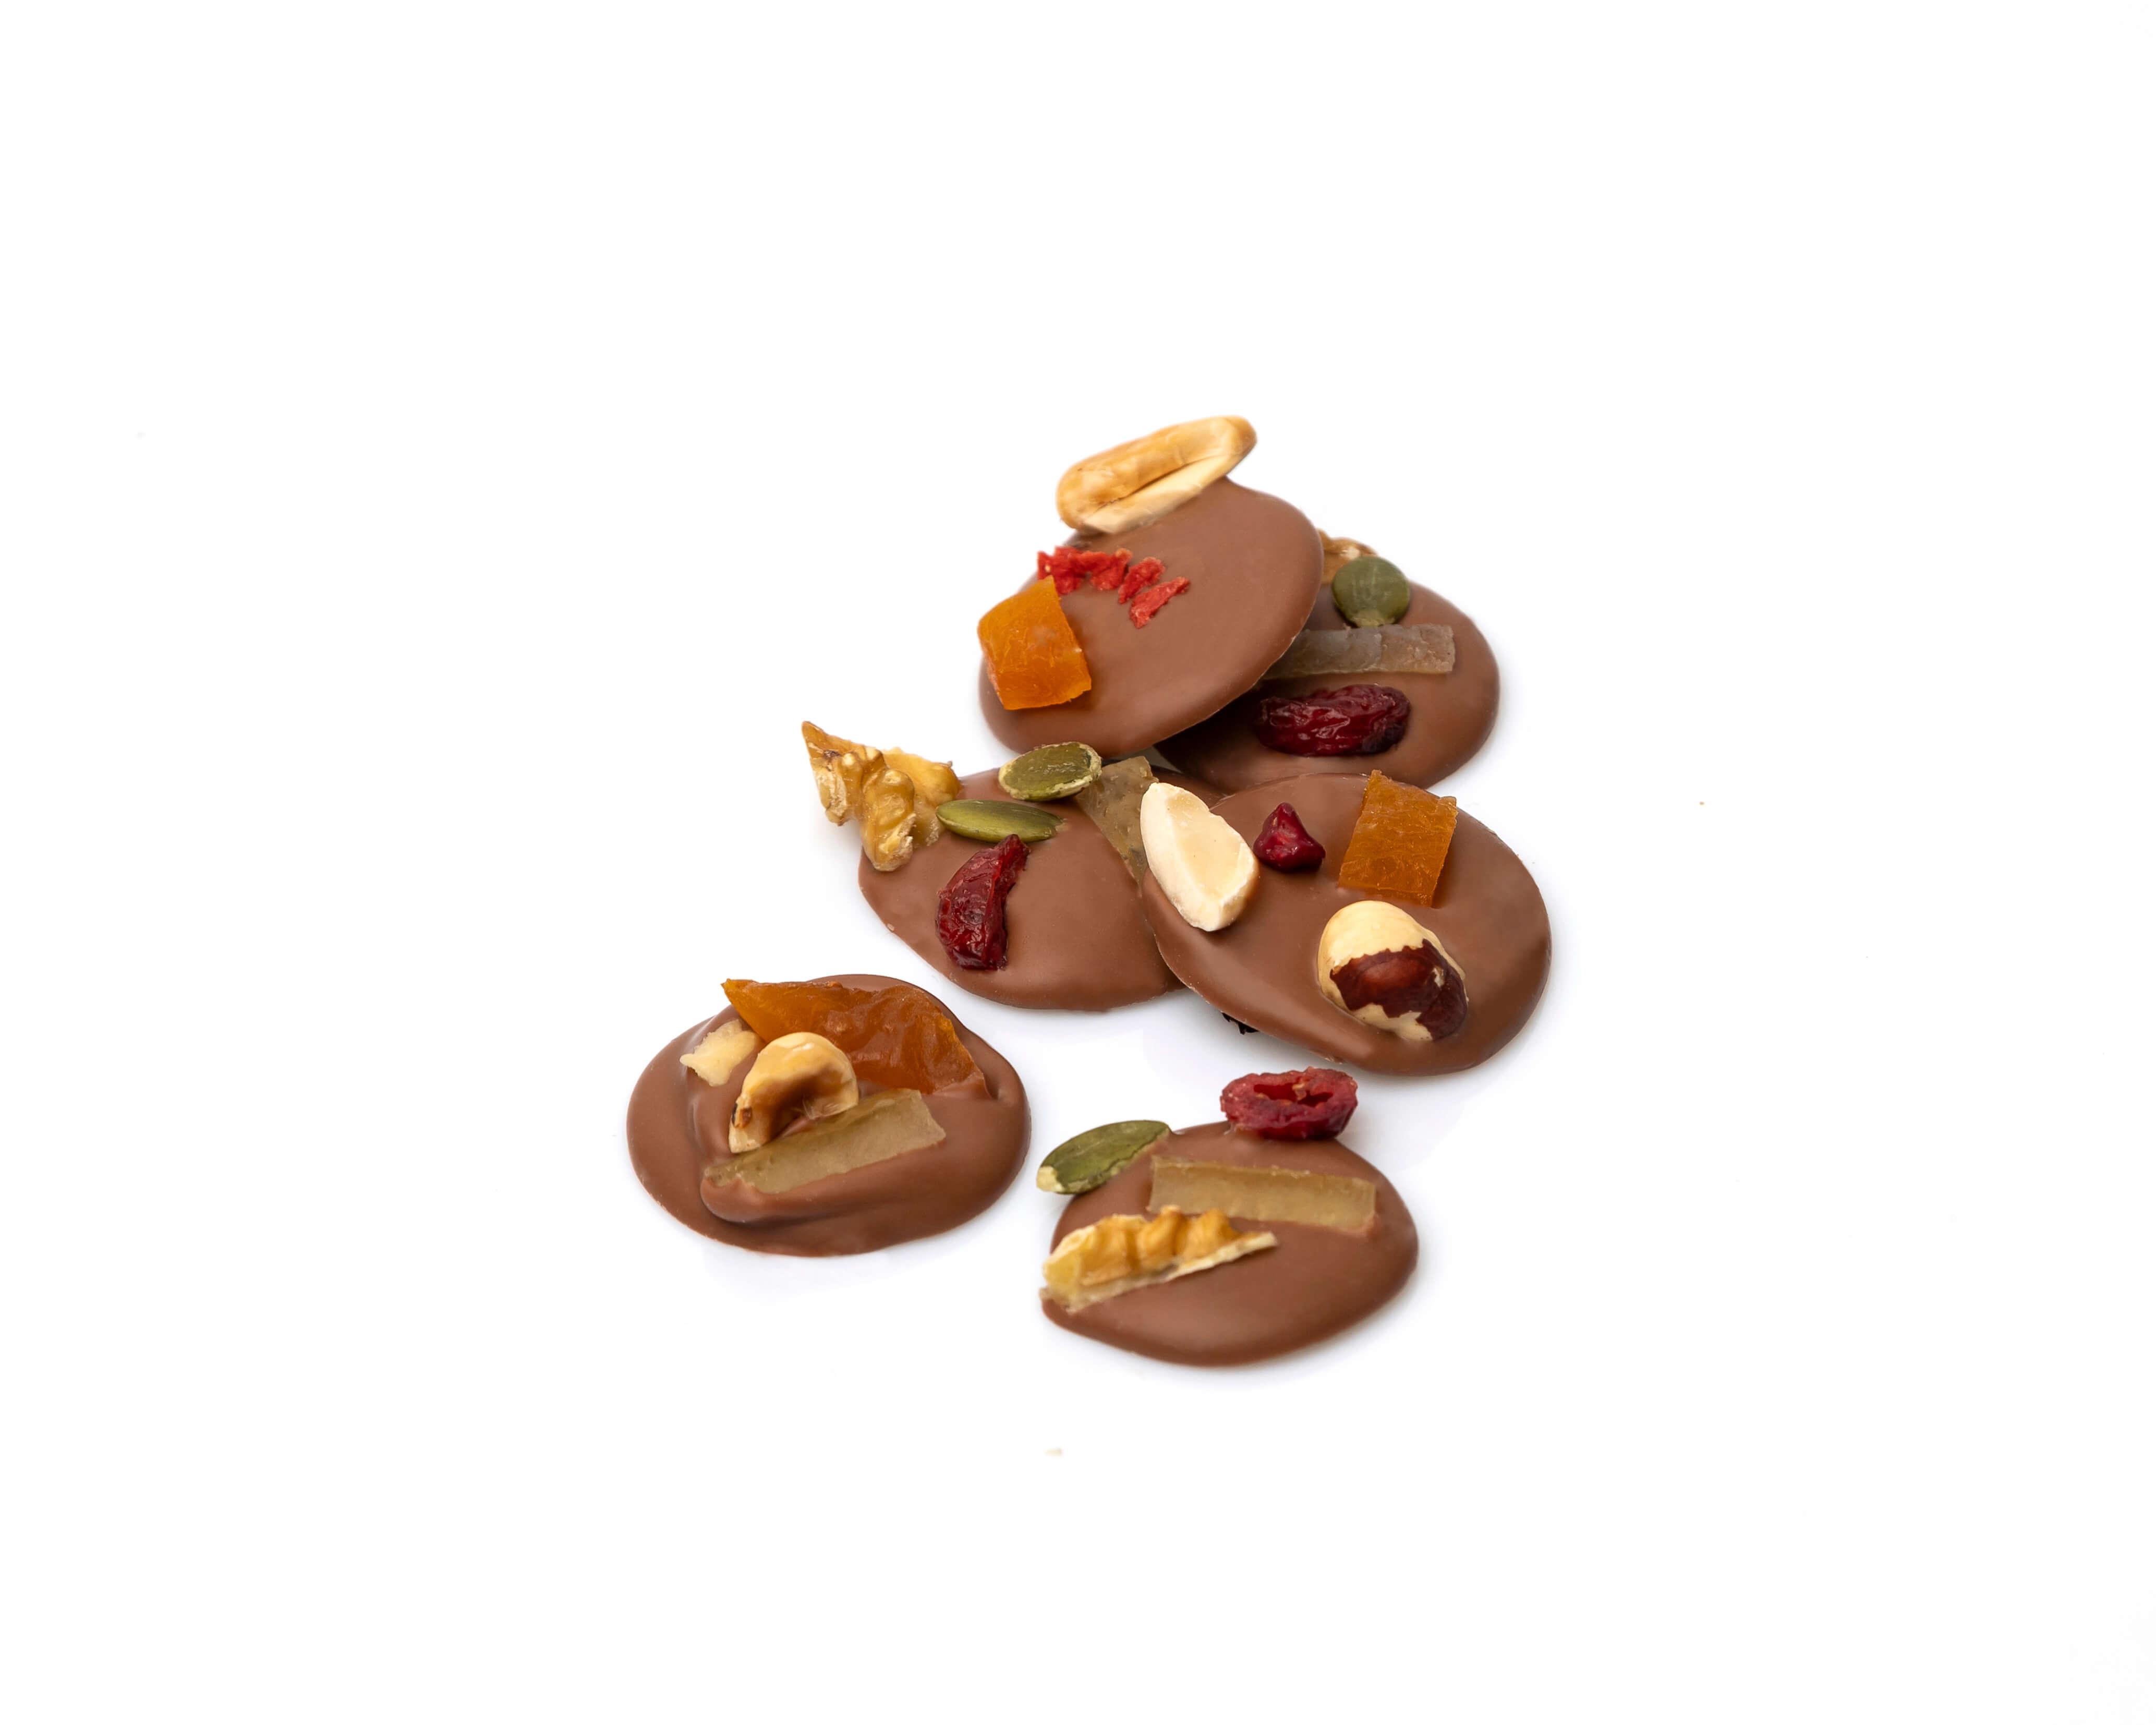 Músicos chocolate bombones frutos secos coruña  músicos de chocolate